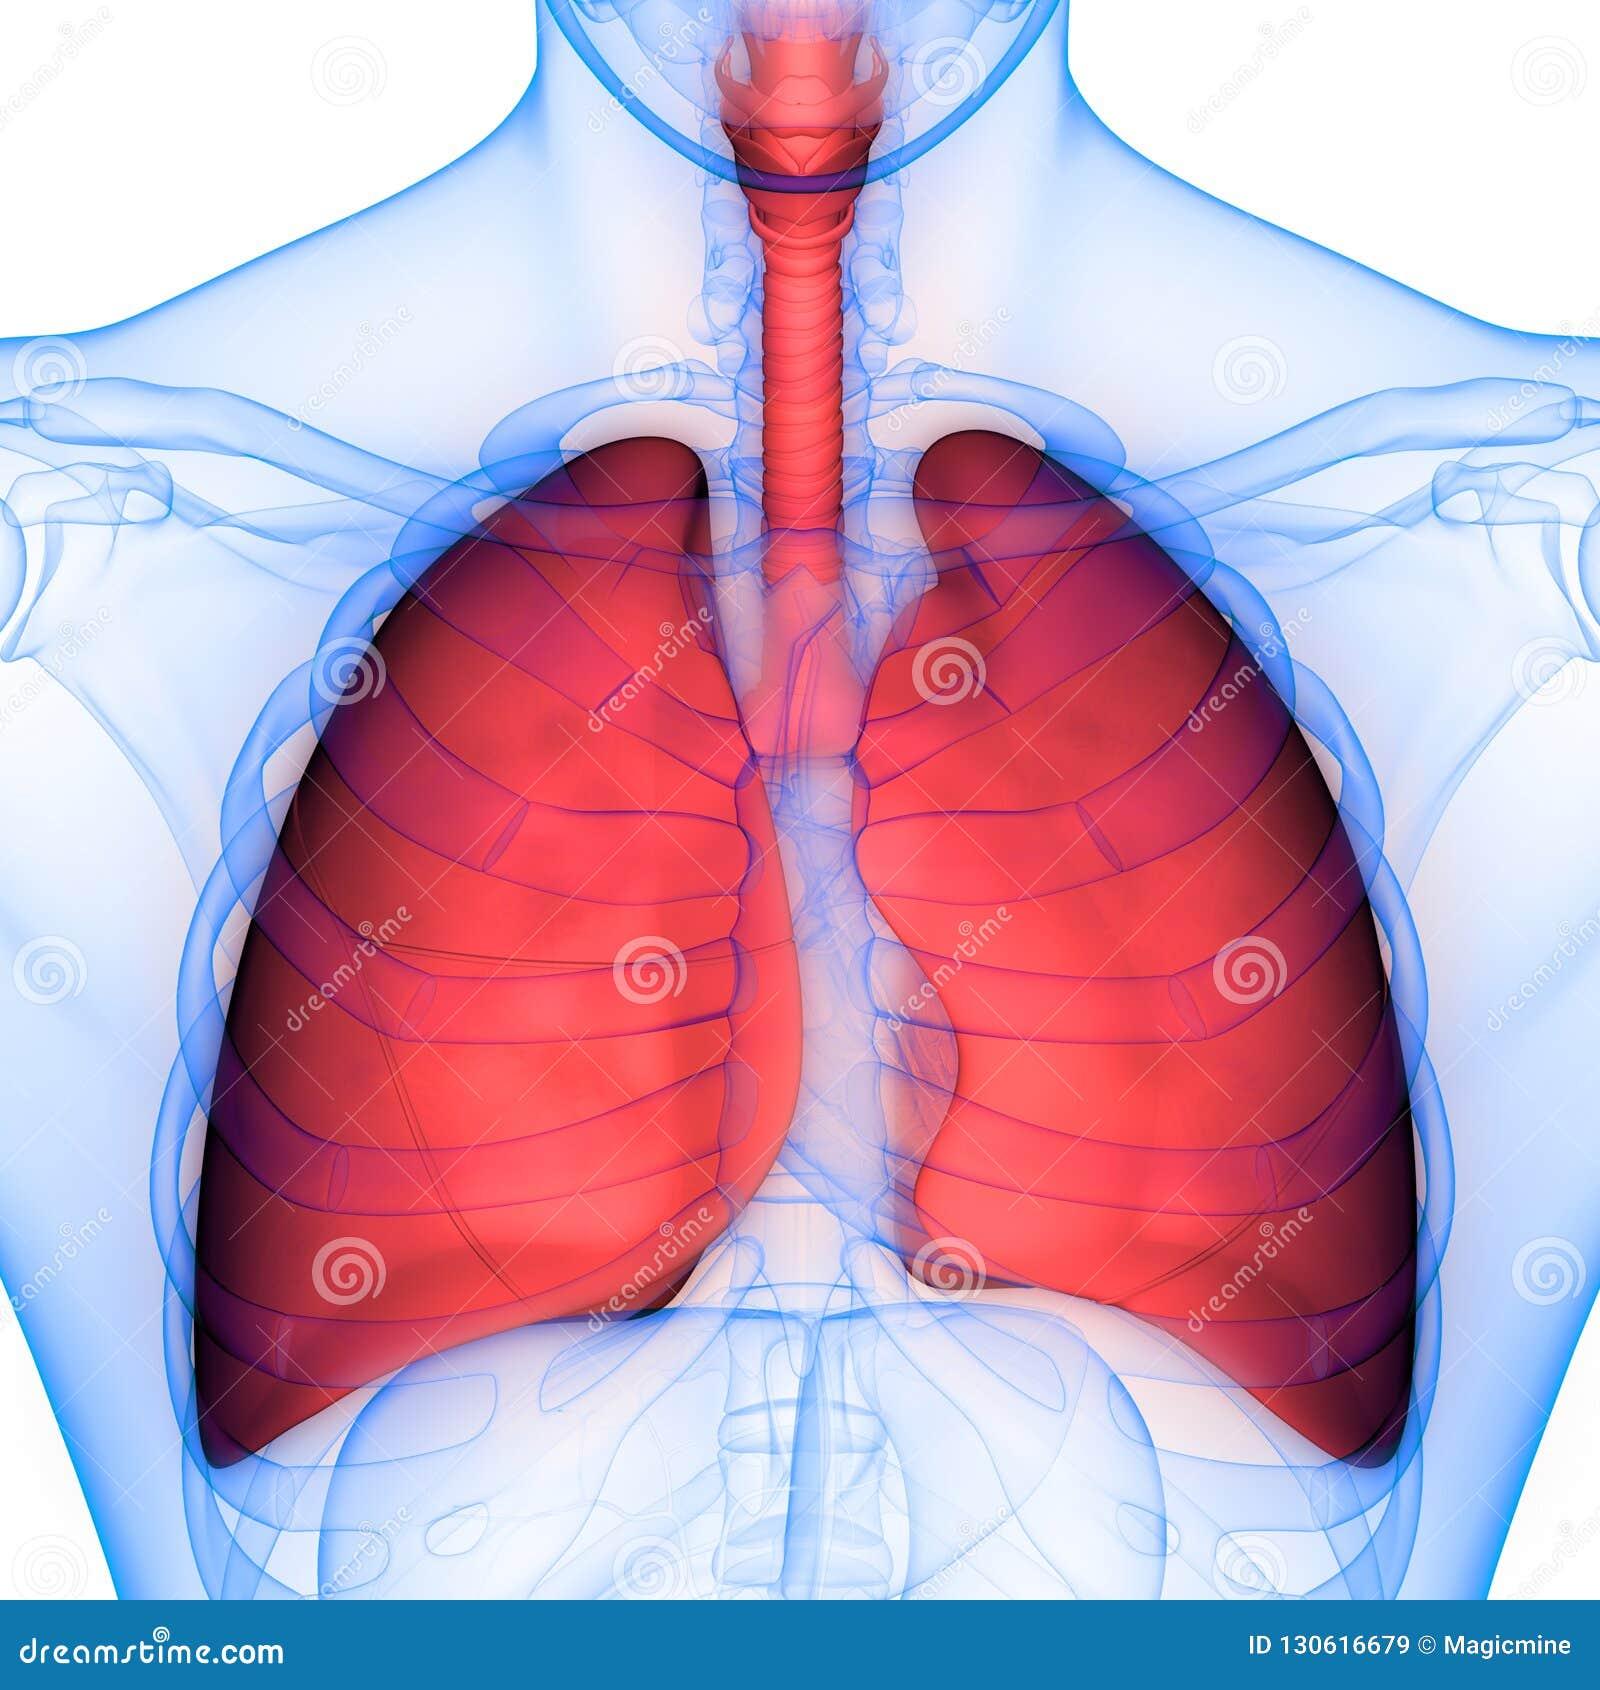 Human Body Organs Respiratory System Lungs Anatomy Stock